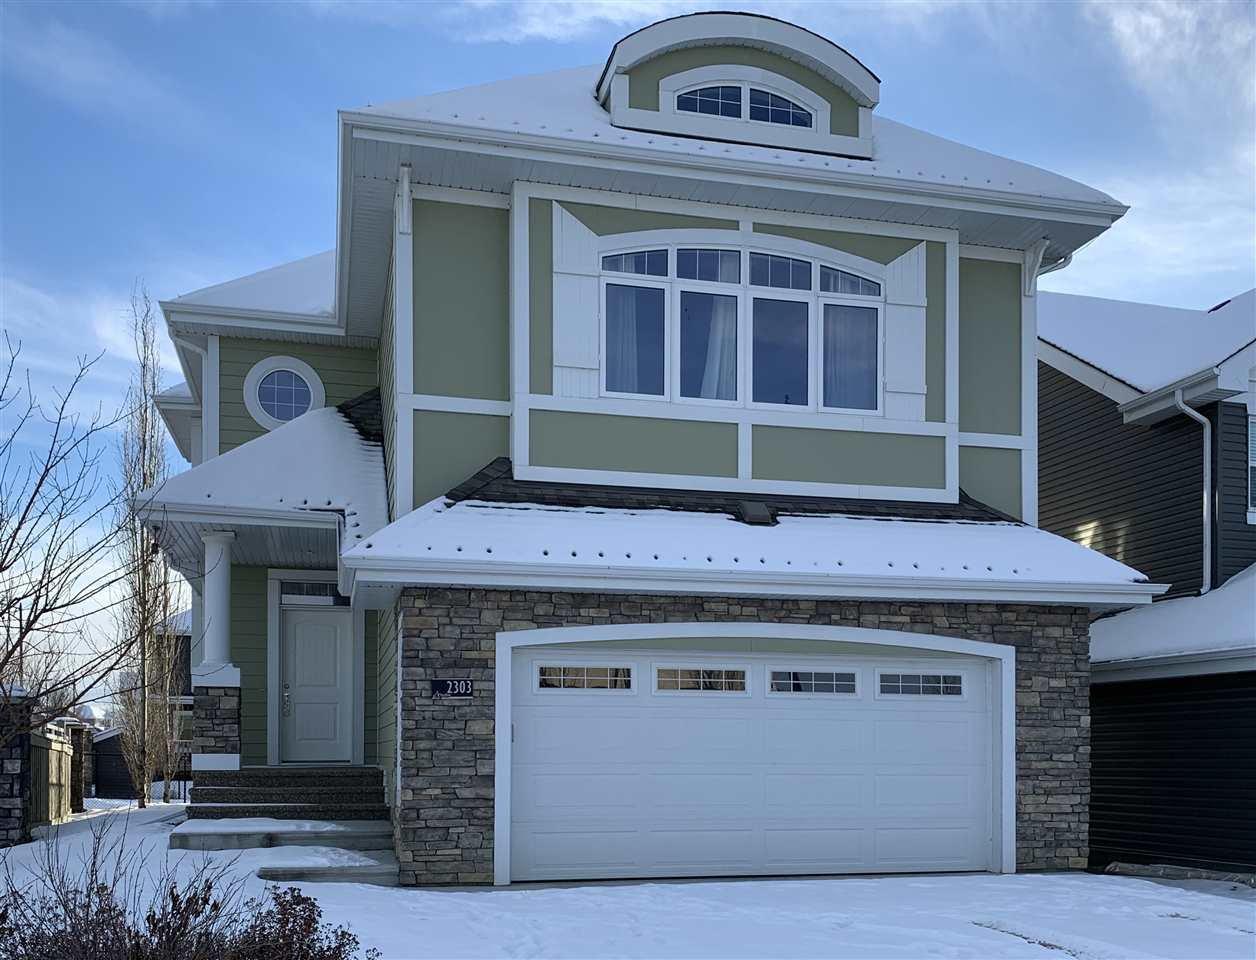 Main Photo: 2303 SPARROW Crescent in Edmonton: Zone 59 House for sale : MLS®# E4182870